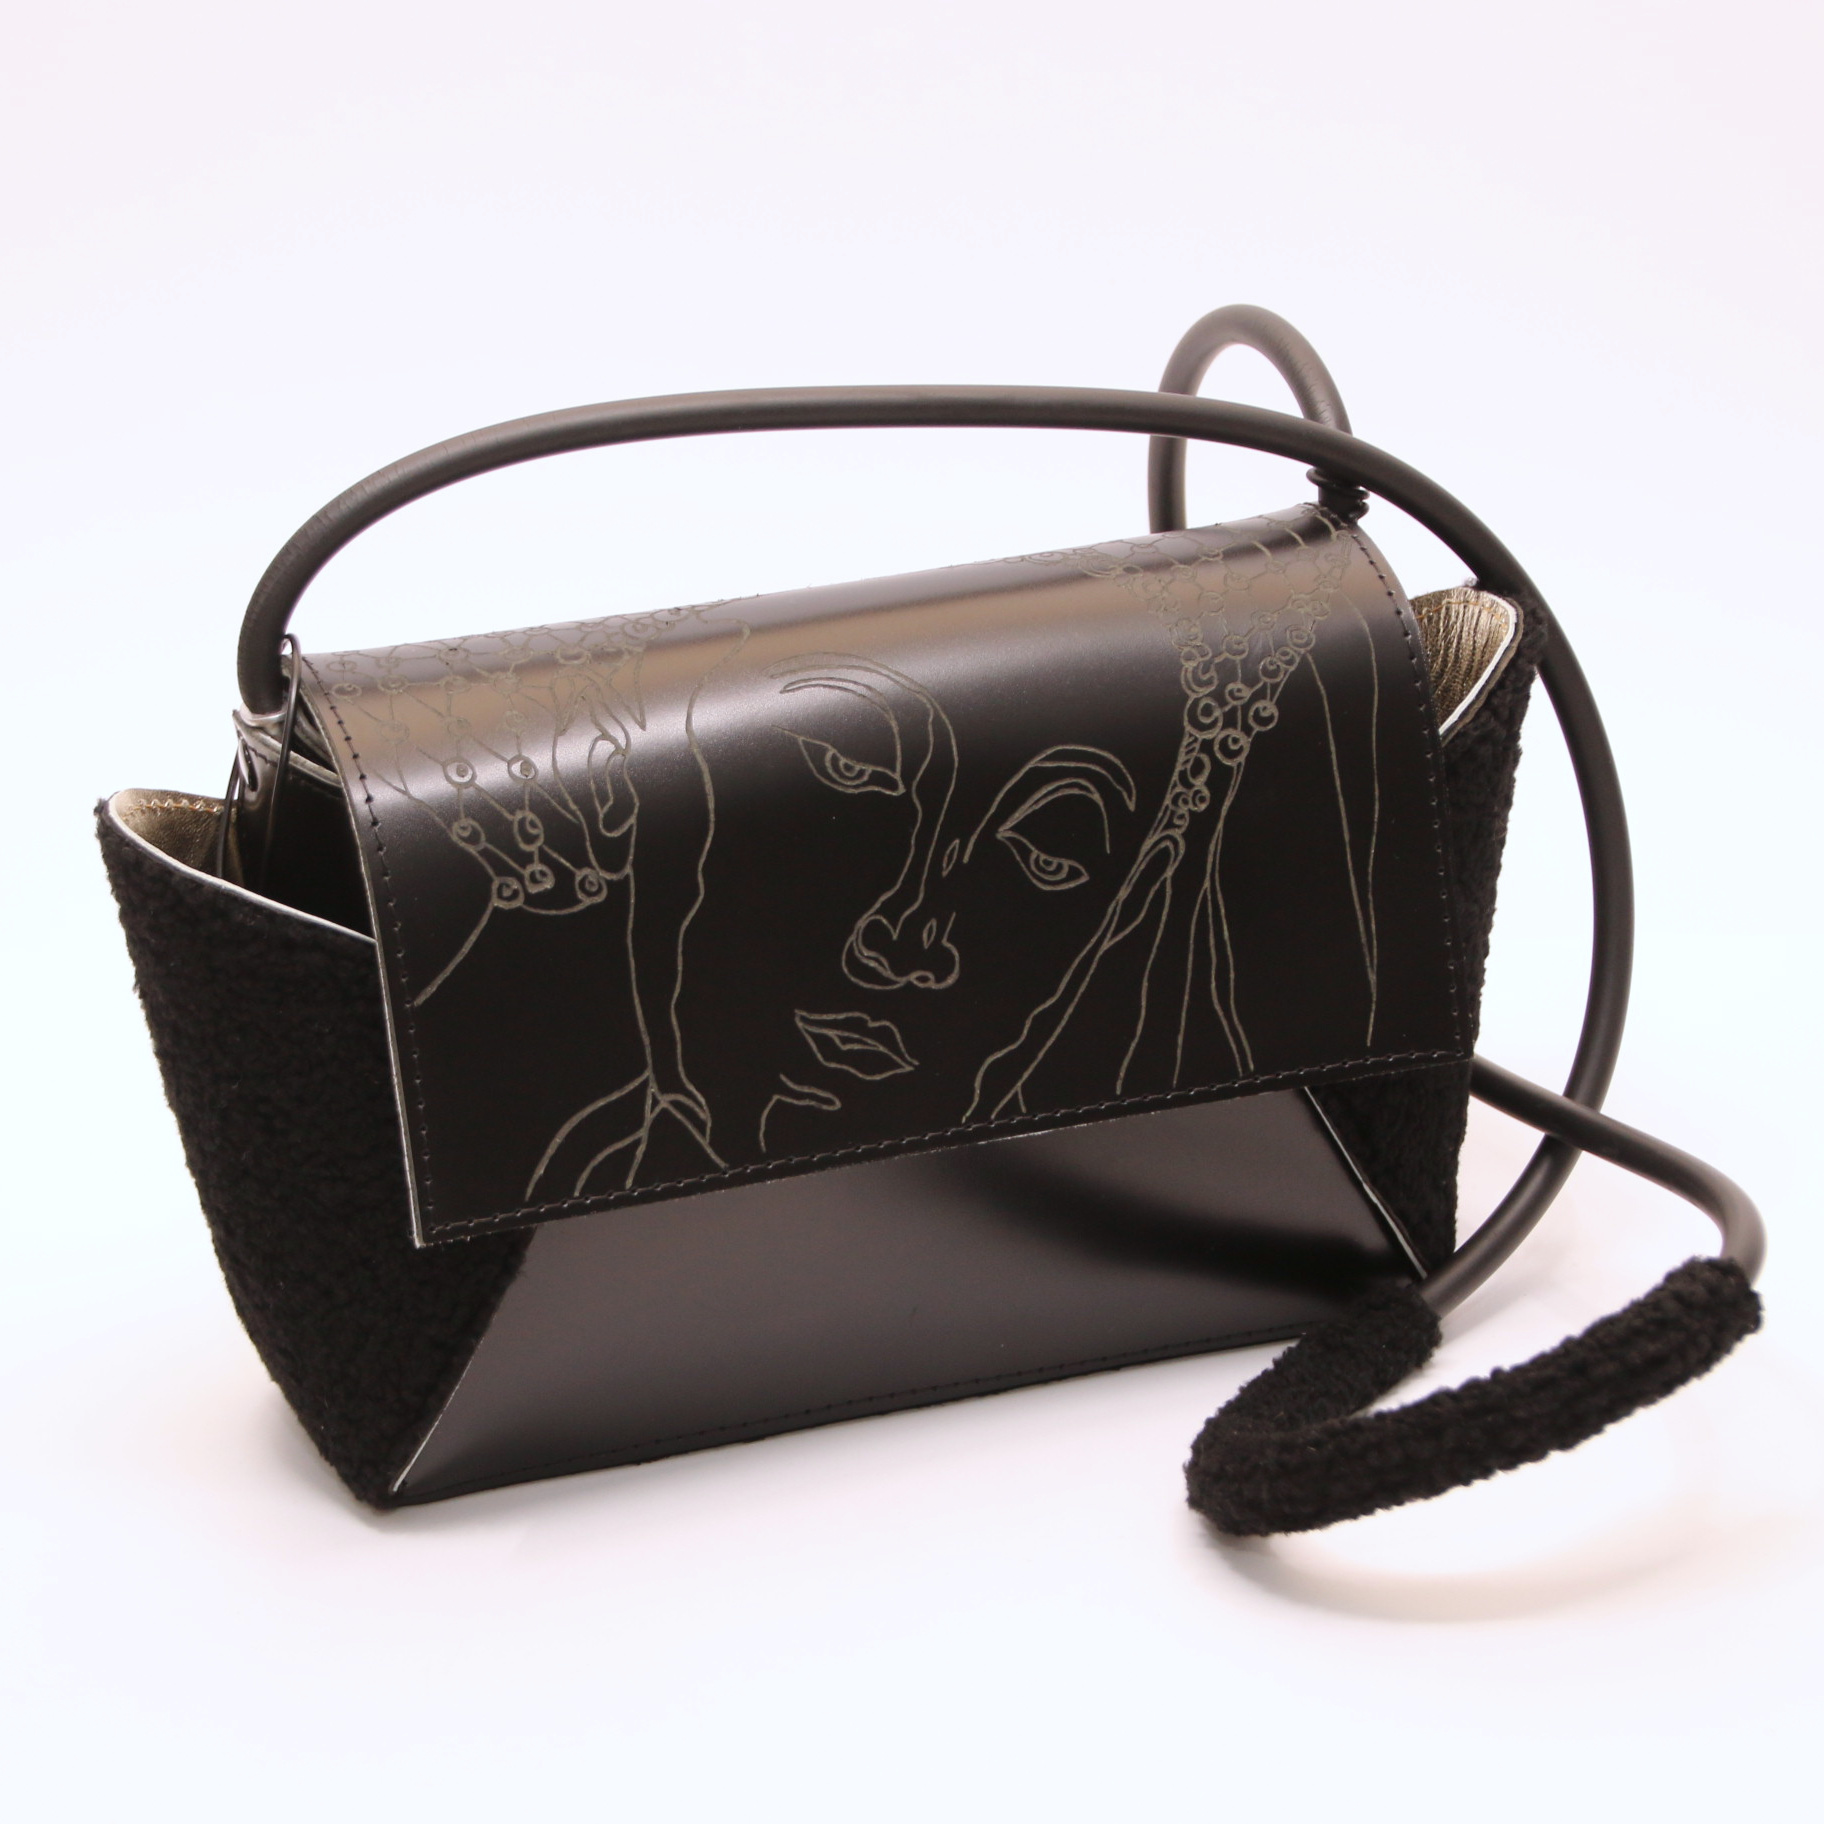 PAARL Unique handmade and engraved handbag print Sybille van Cumaé - PAARL